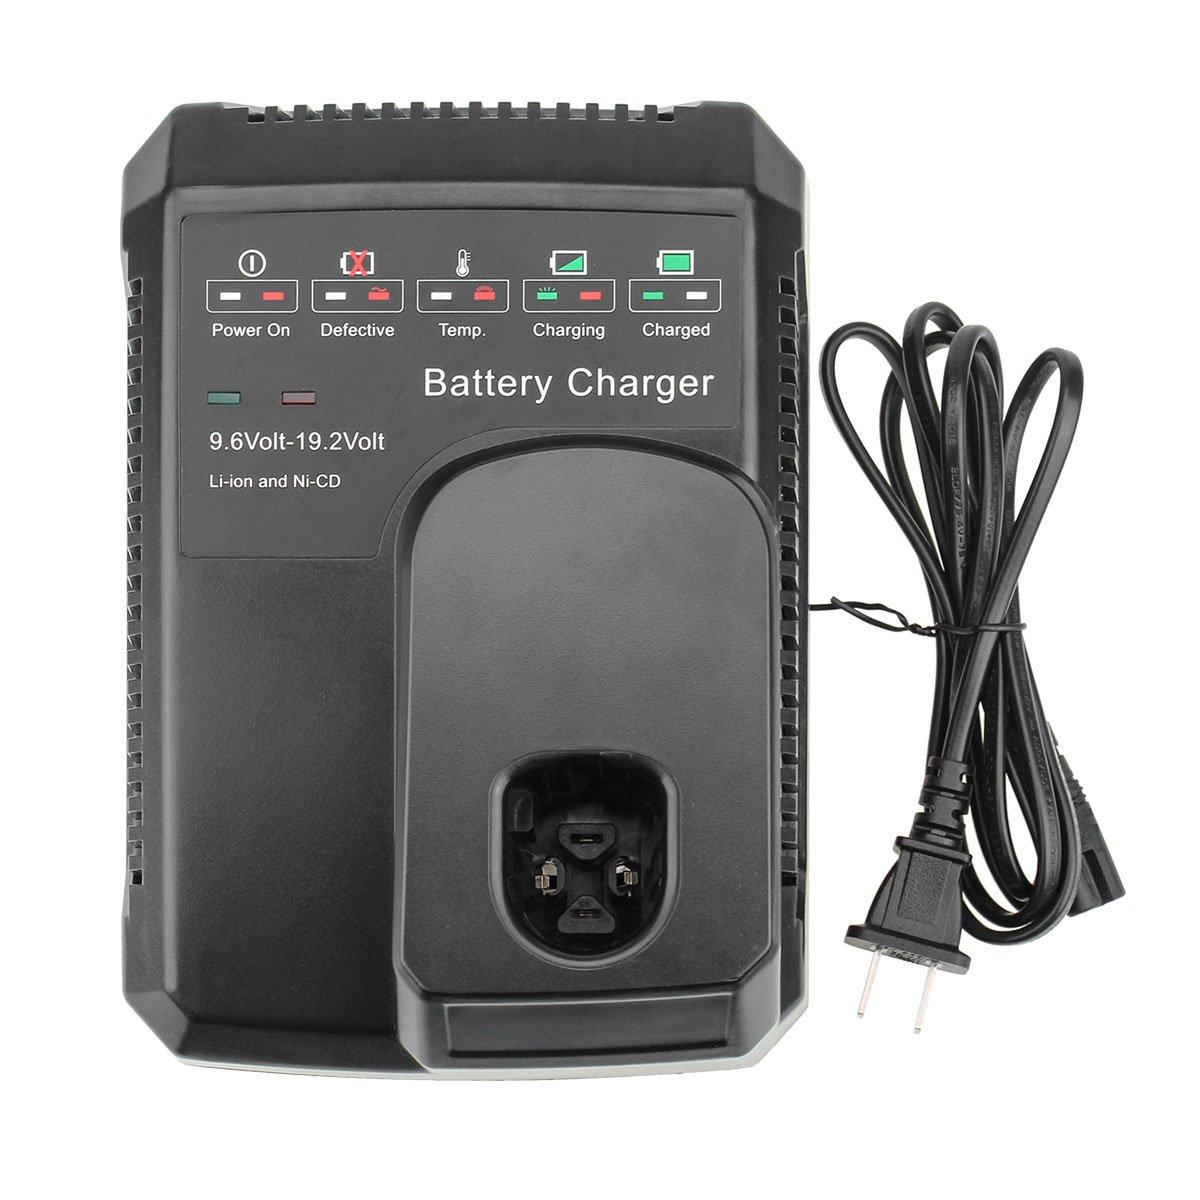 Munikind for Craftsman 19.2 Volt Battery Charger 9.6V-19.2V Lithium NiCD NiMH C3 DieHard XCP 1425301 1323903 130279005 11375 11376 315.PP2011